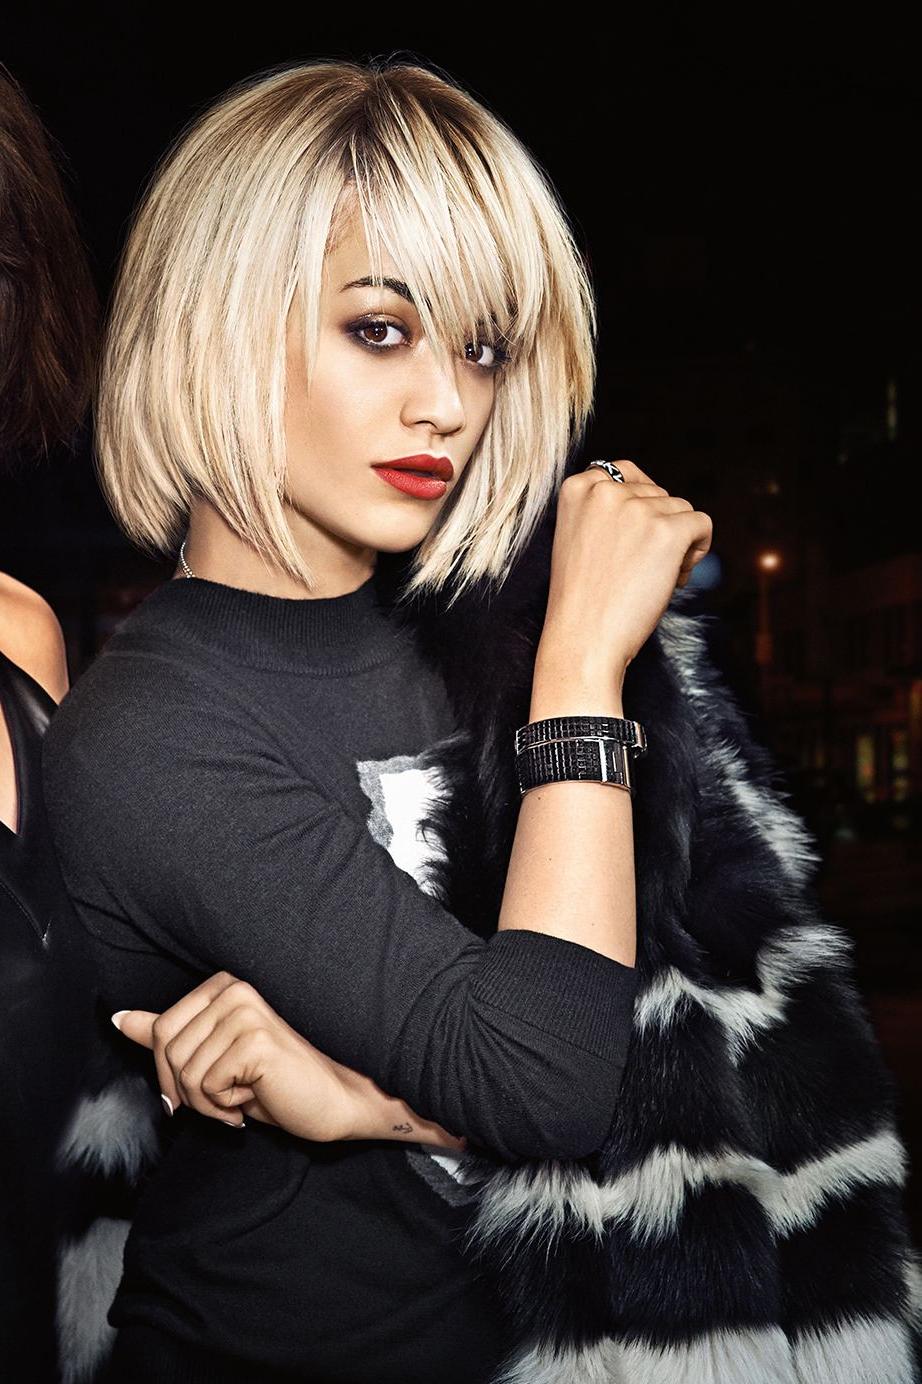 Rita Ora (View 9 of 20)